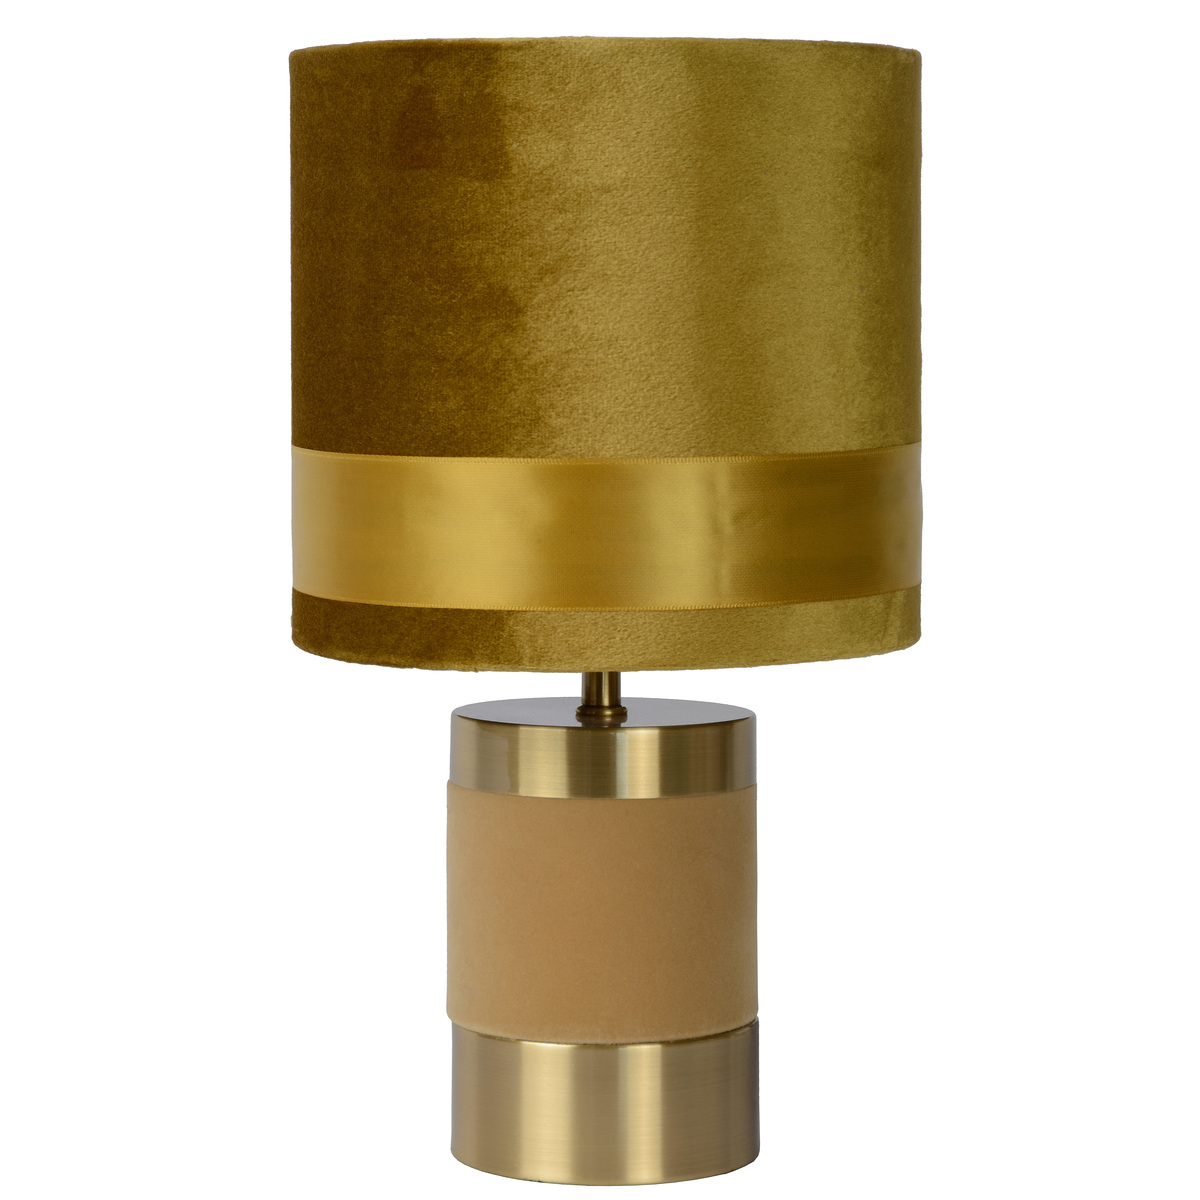 Lampe en métal jaune